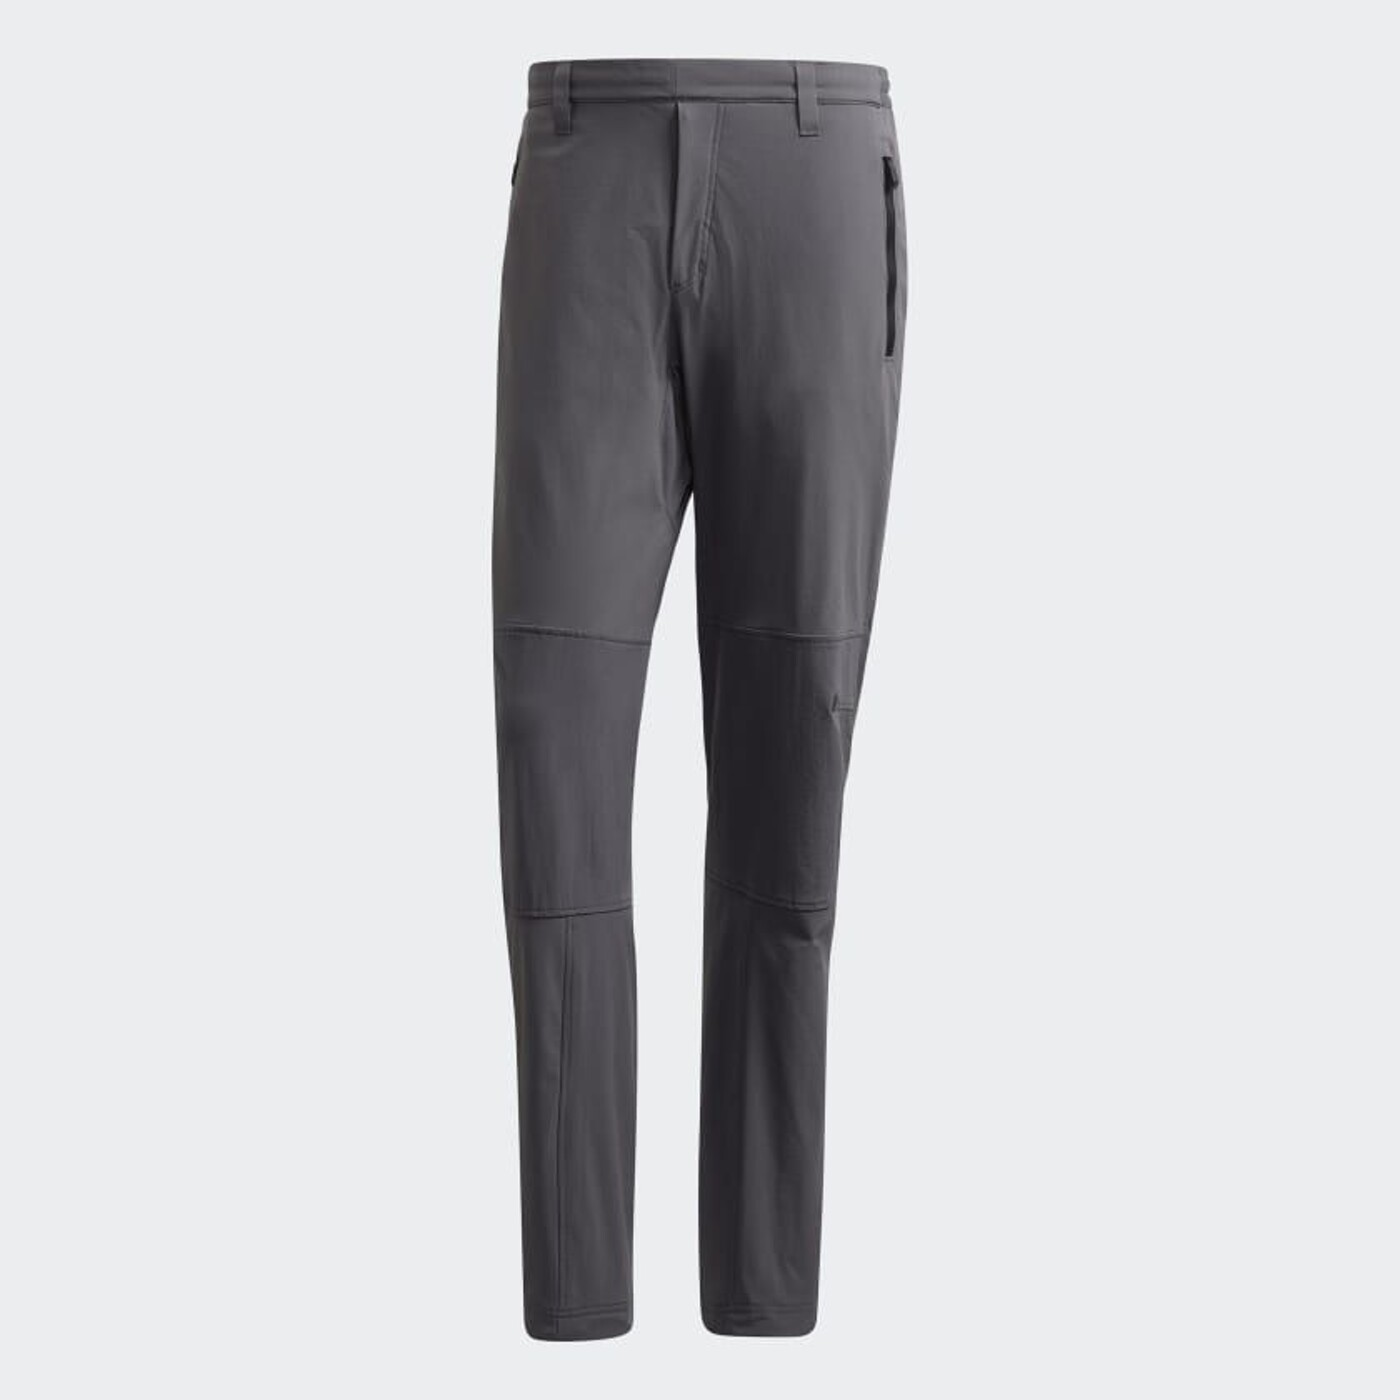 ADIDAS TX Multi Pants - Herren